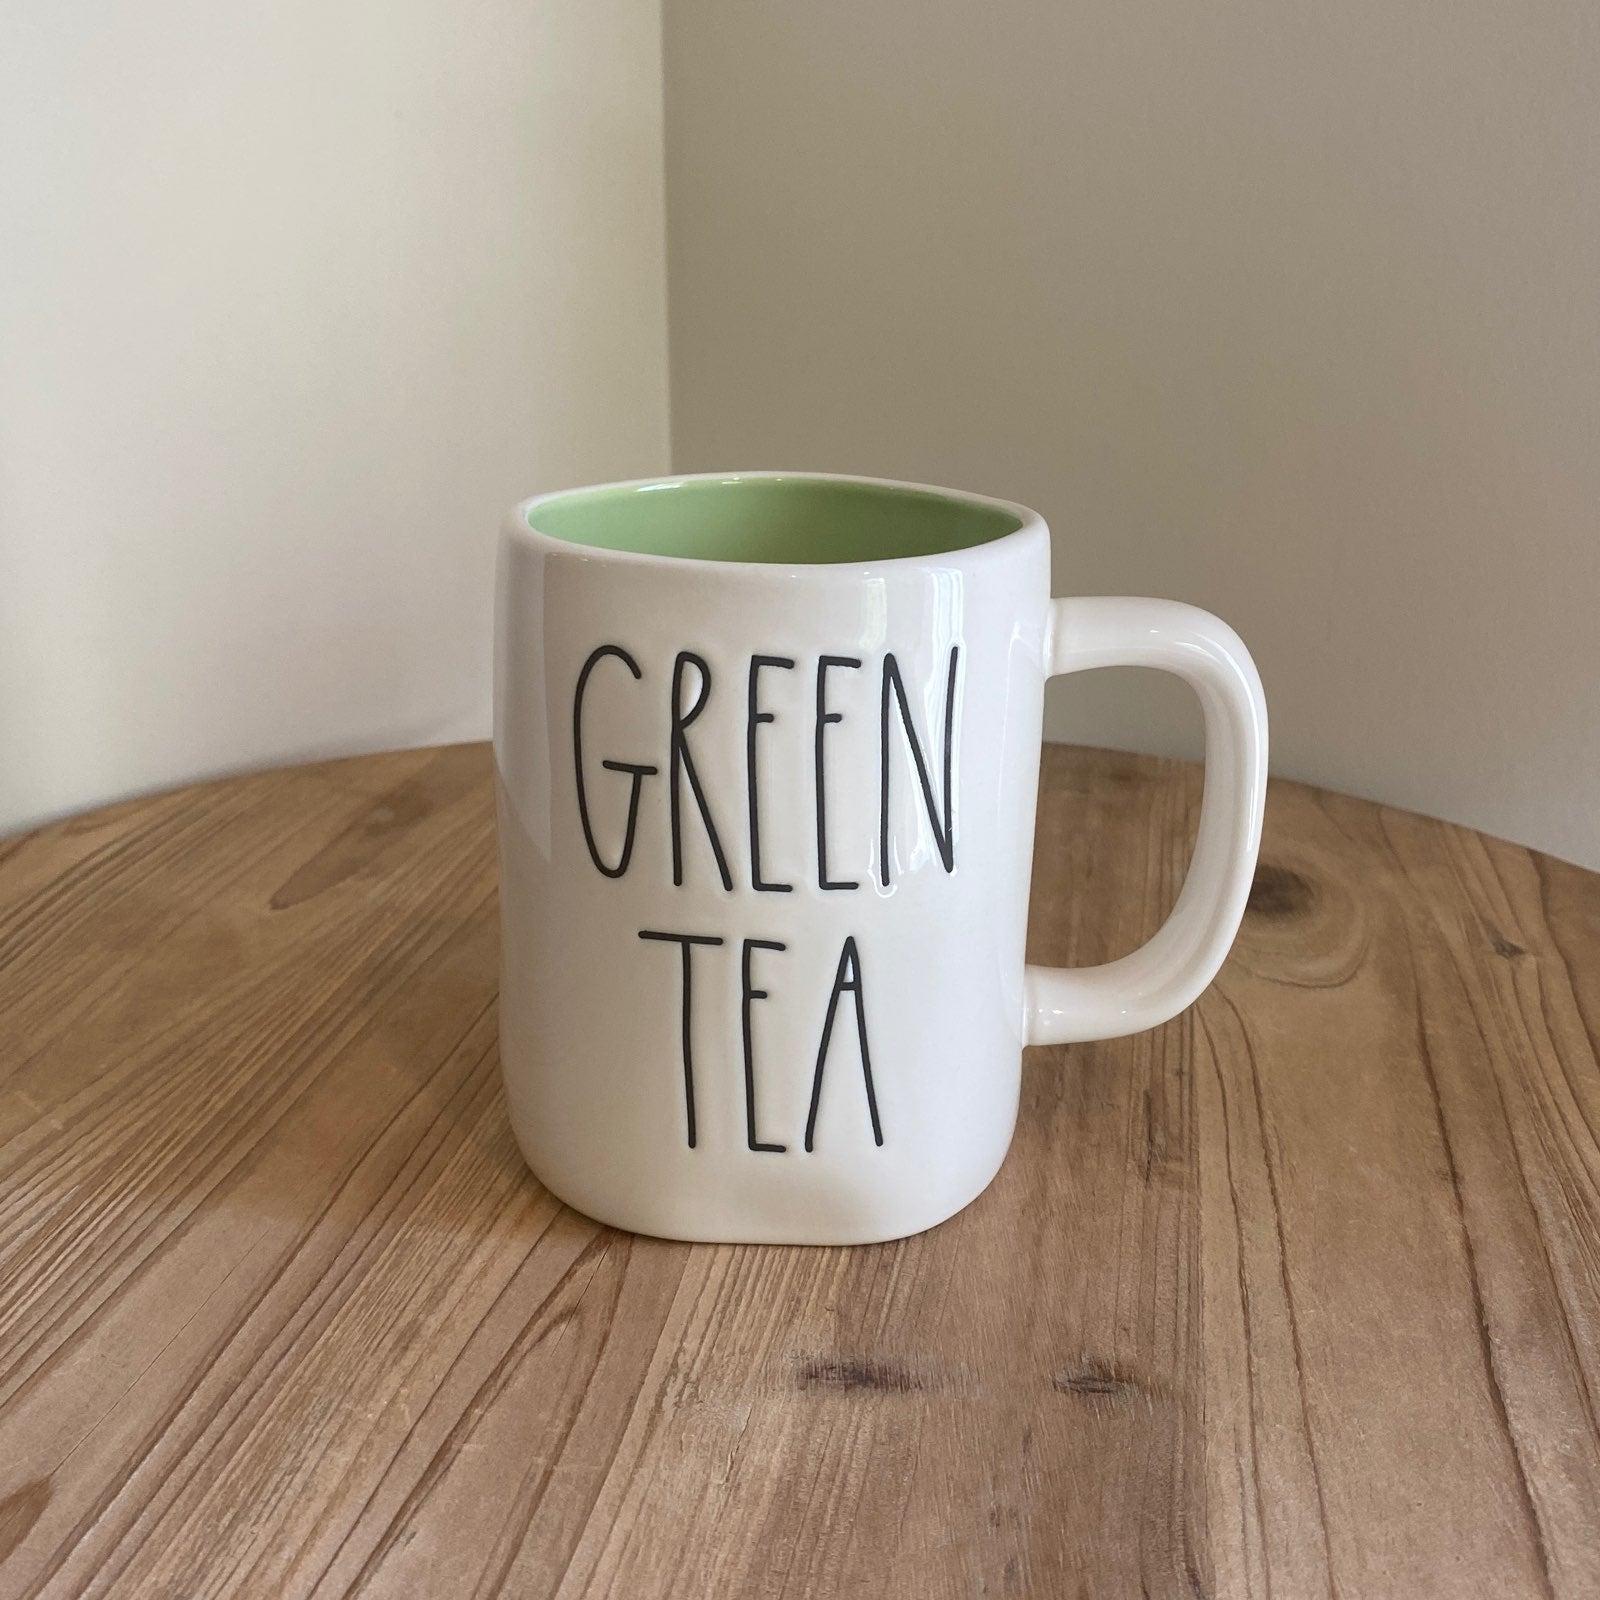 Rae Dunn Green Tea Mug